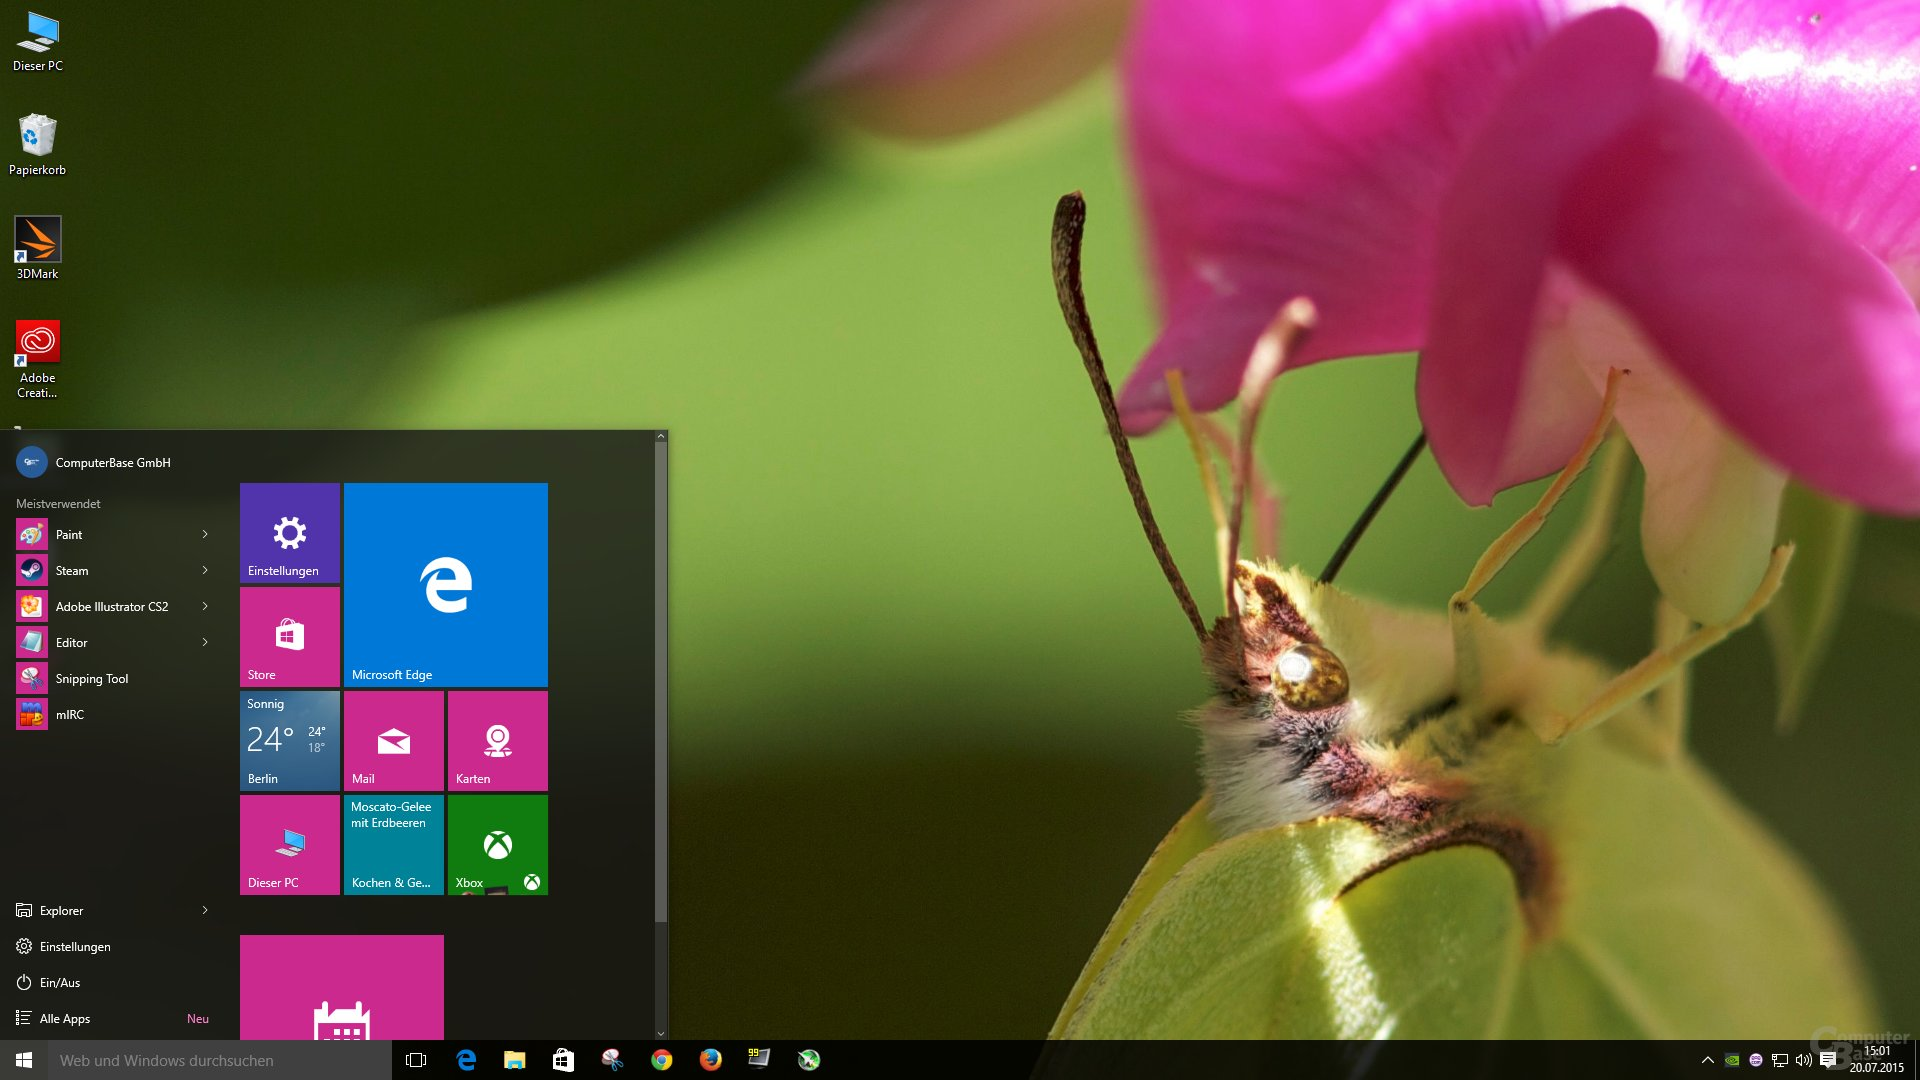 Aktuelles Startmenü in Windows 10 Build 10240